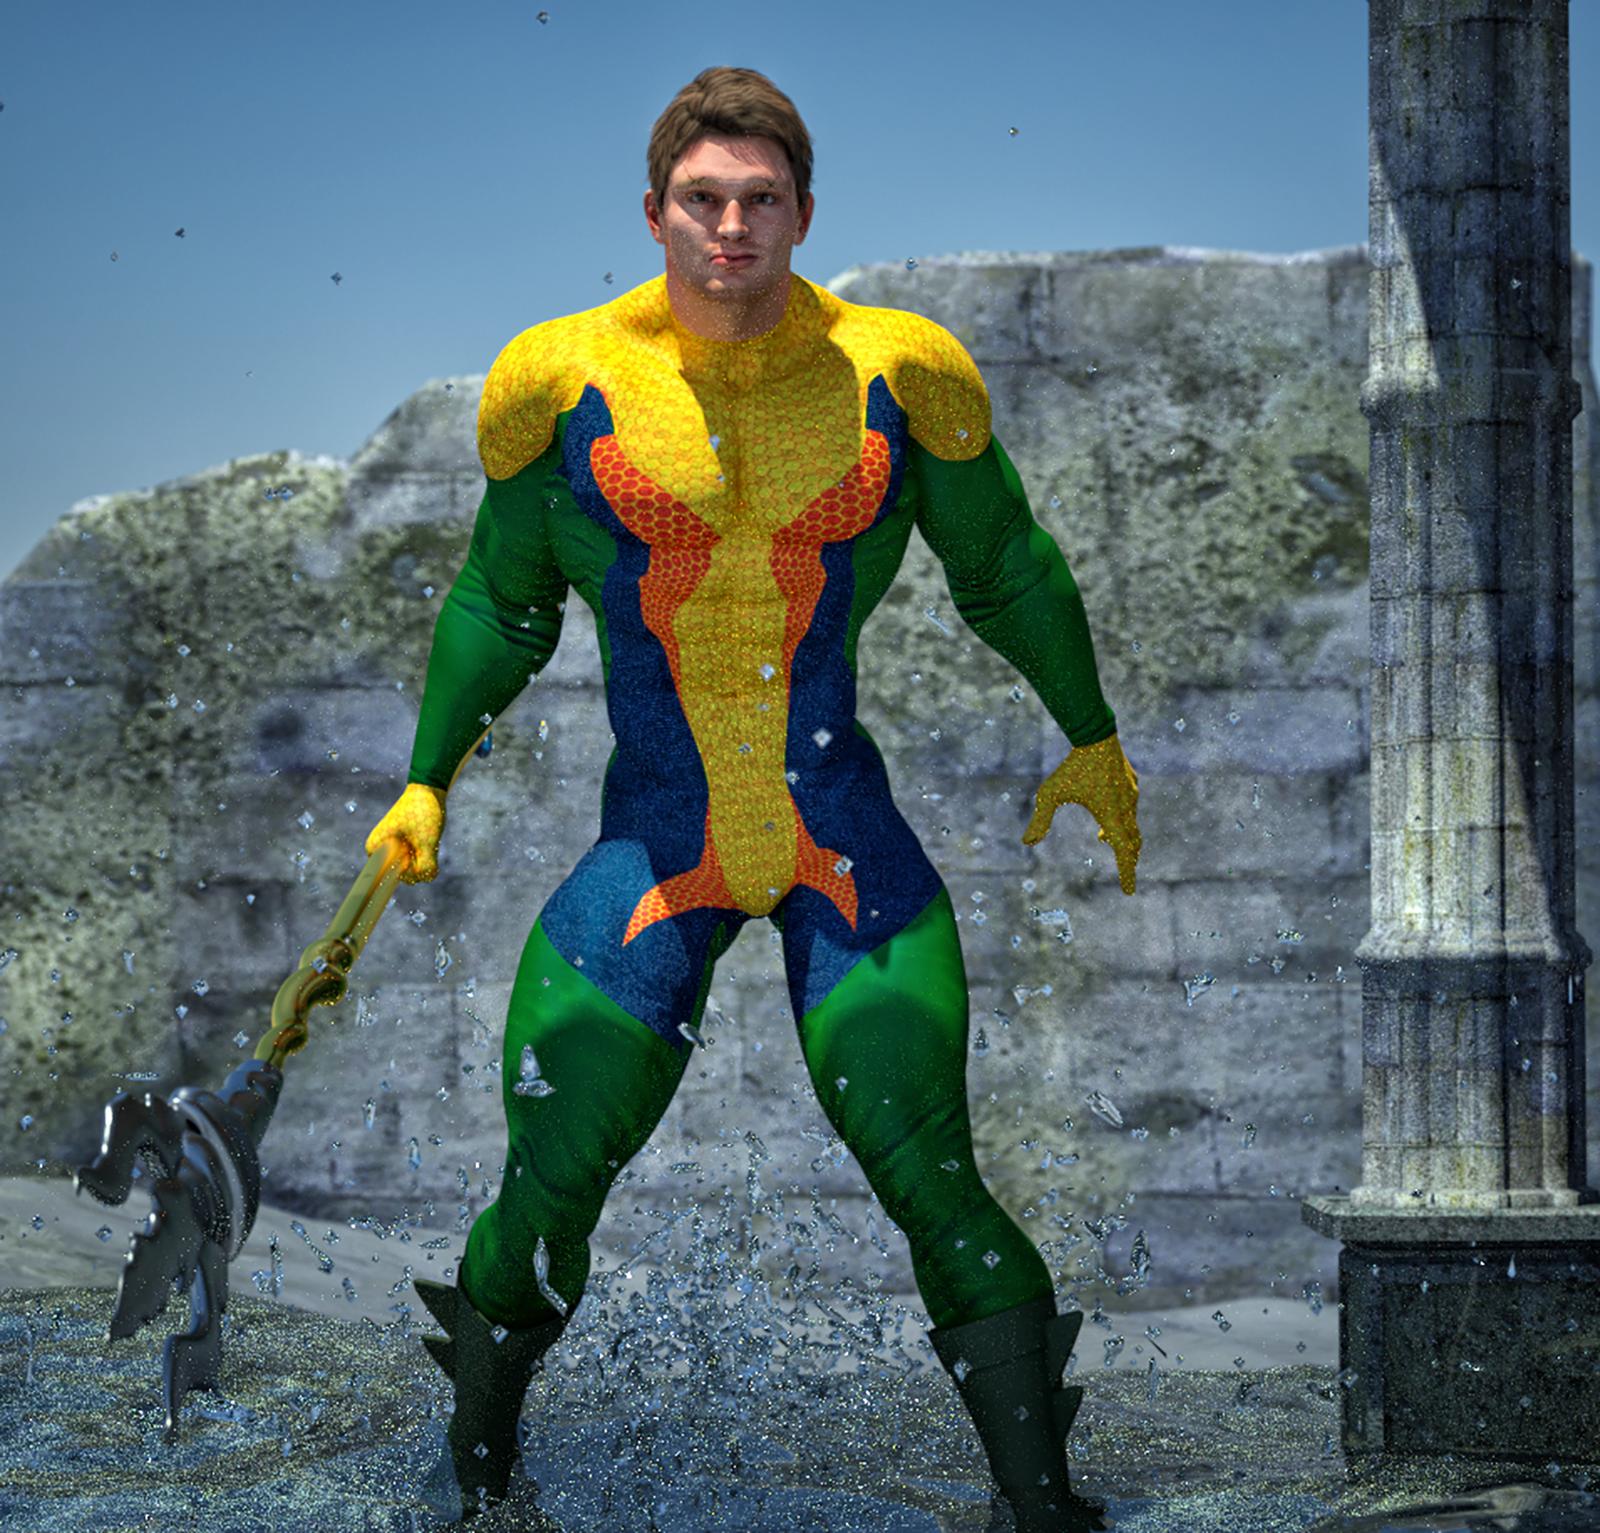 Aquaman second skin textures for M4